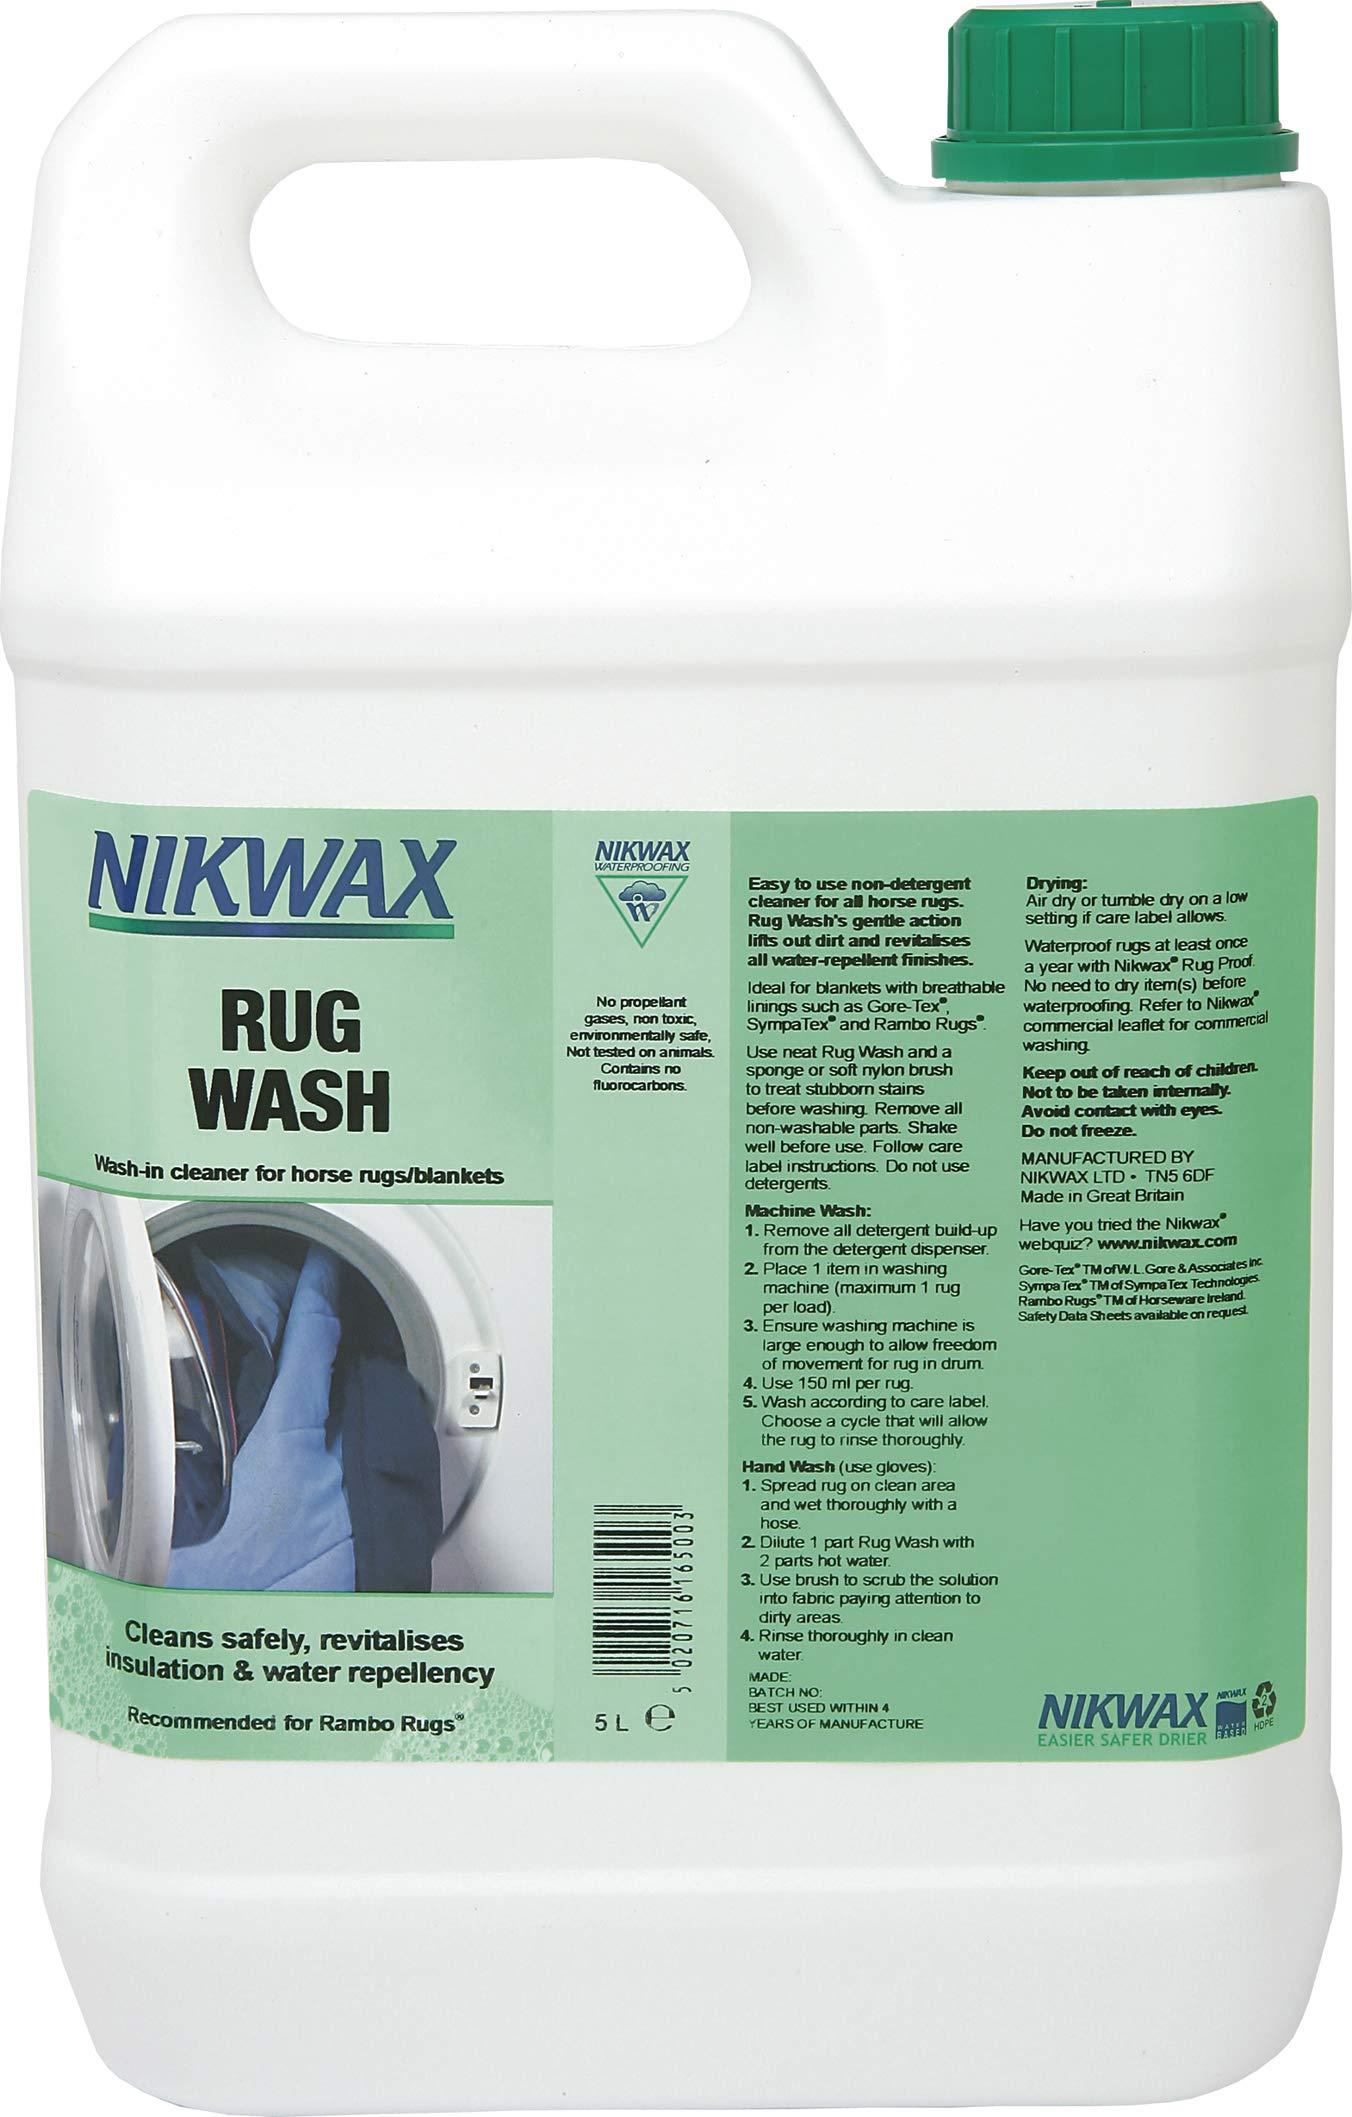 NIKWAX RUG WASH EQUIPMENT CLEANER (5LITRE) by Nikwax (Image #1)